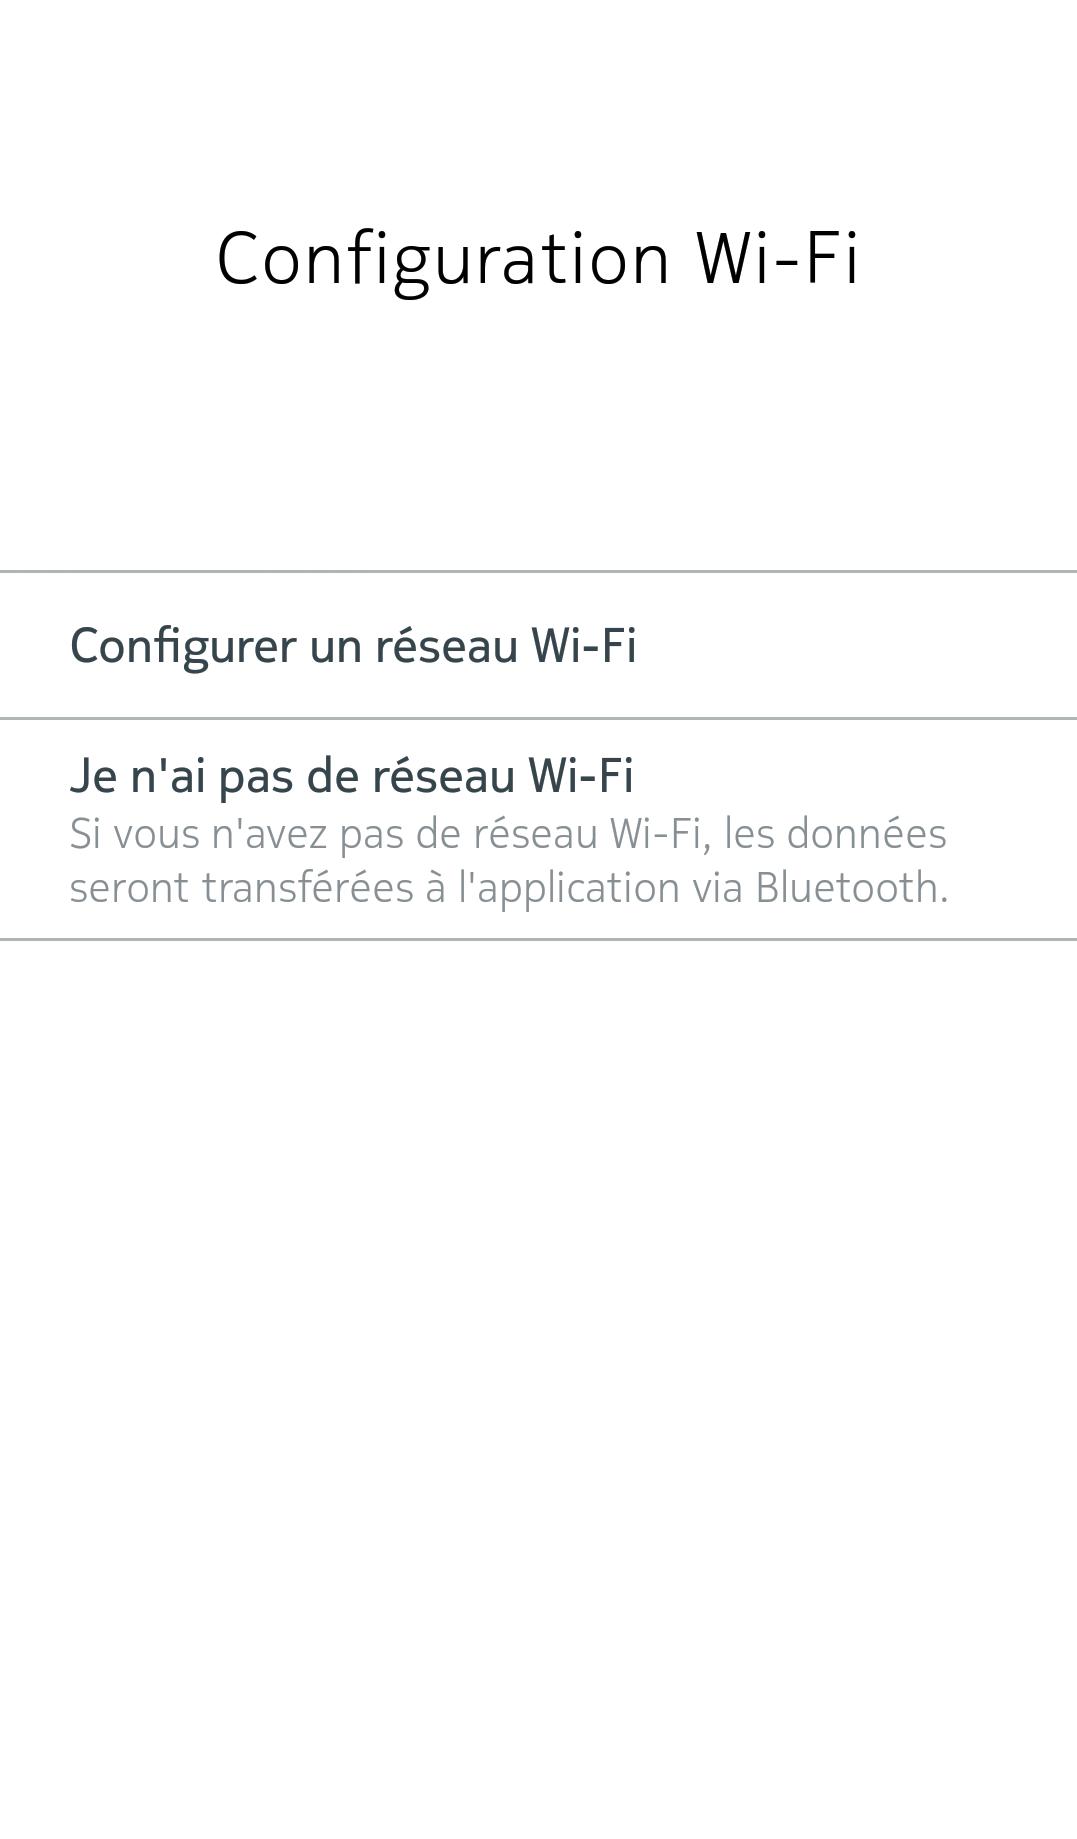 Choix_BT_ou_wifi.png